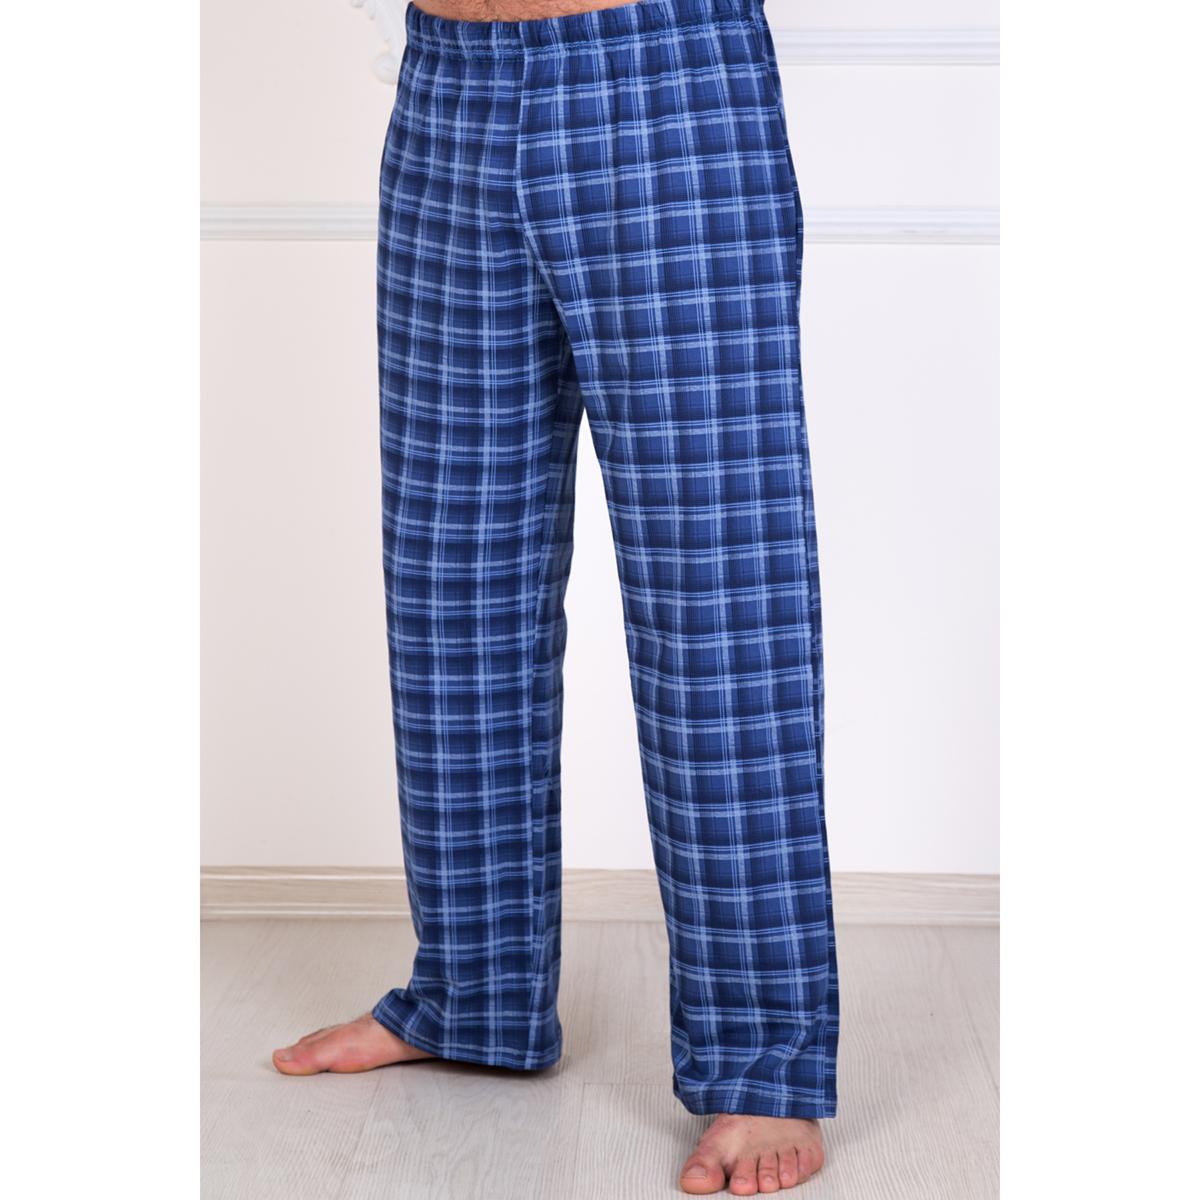 Мужские брюки  Клетка , размер 48 - Мужская одежда артикул: 16180